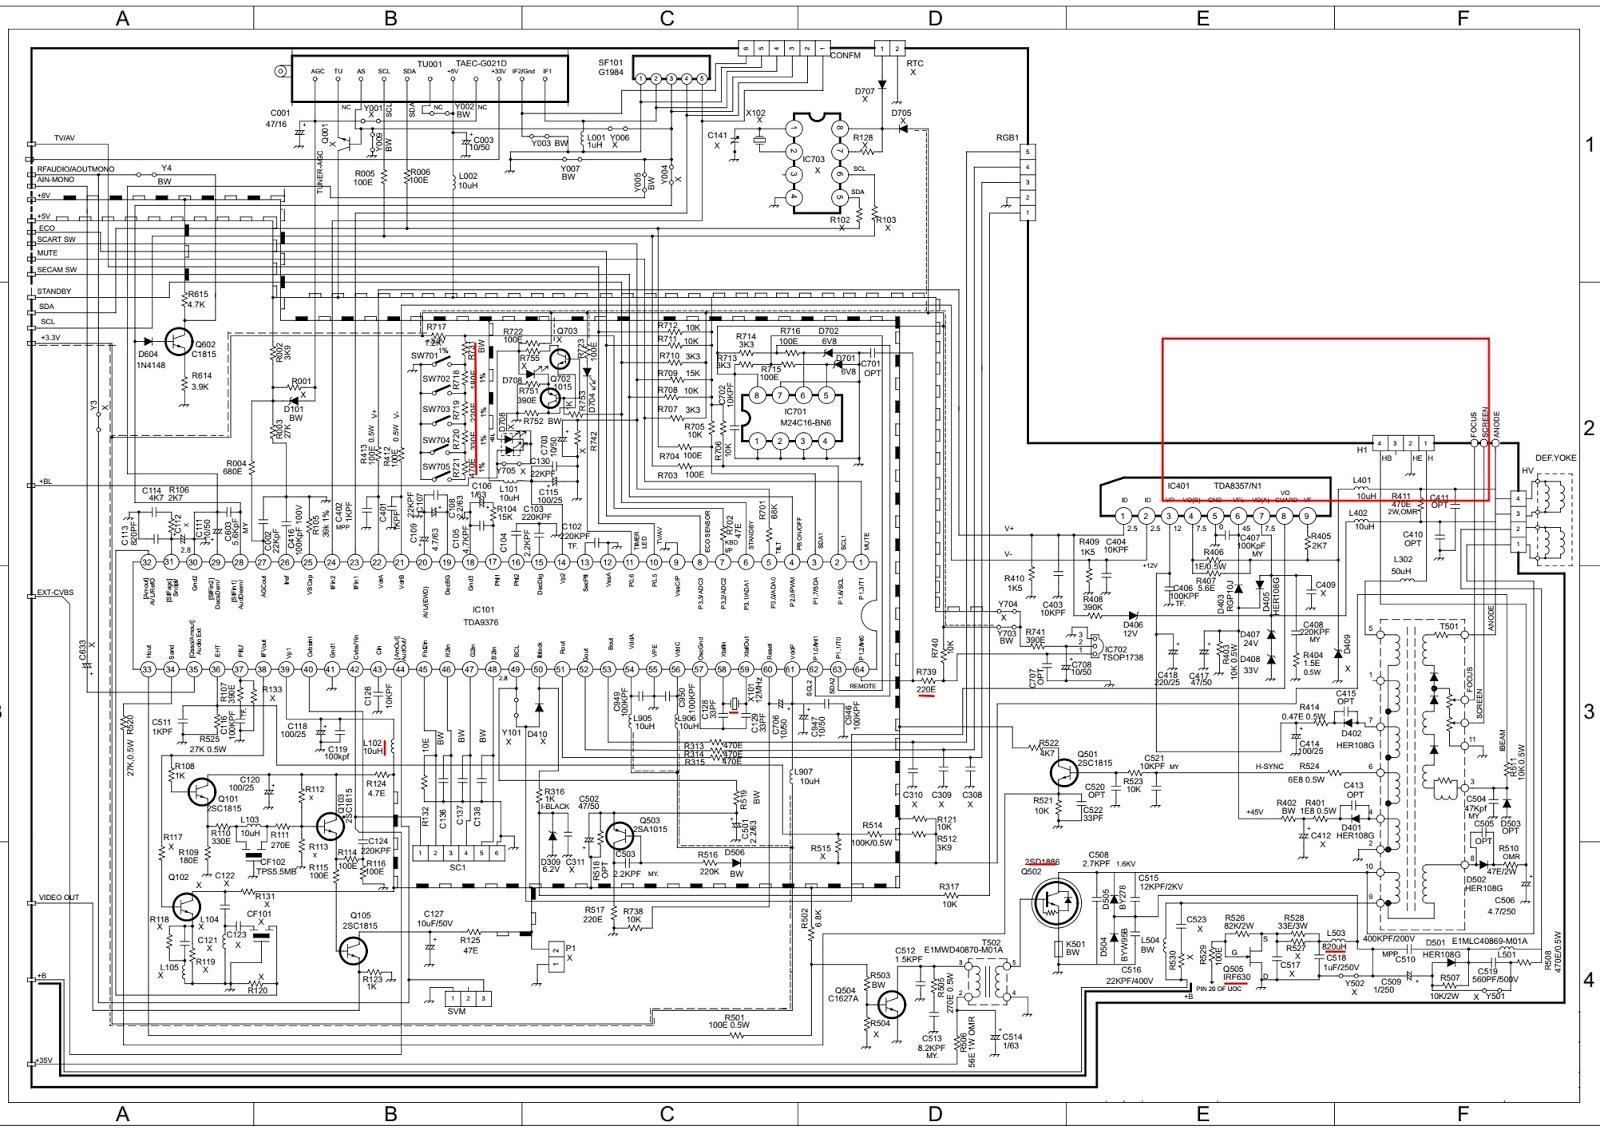 used ics tda9376 tda8357 n1 mc24c16 bn6 taec g021d tuner tda7297 njm1136l hfe4052bp str f6655tda6107 [ 1600 x 1134 Pixel ]